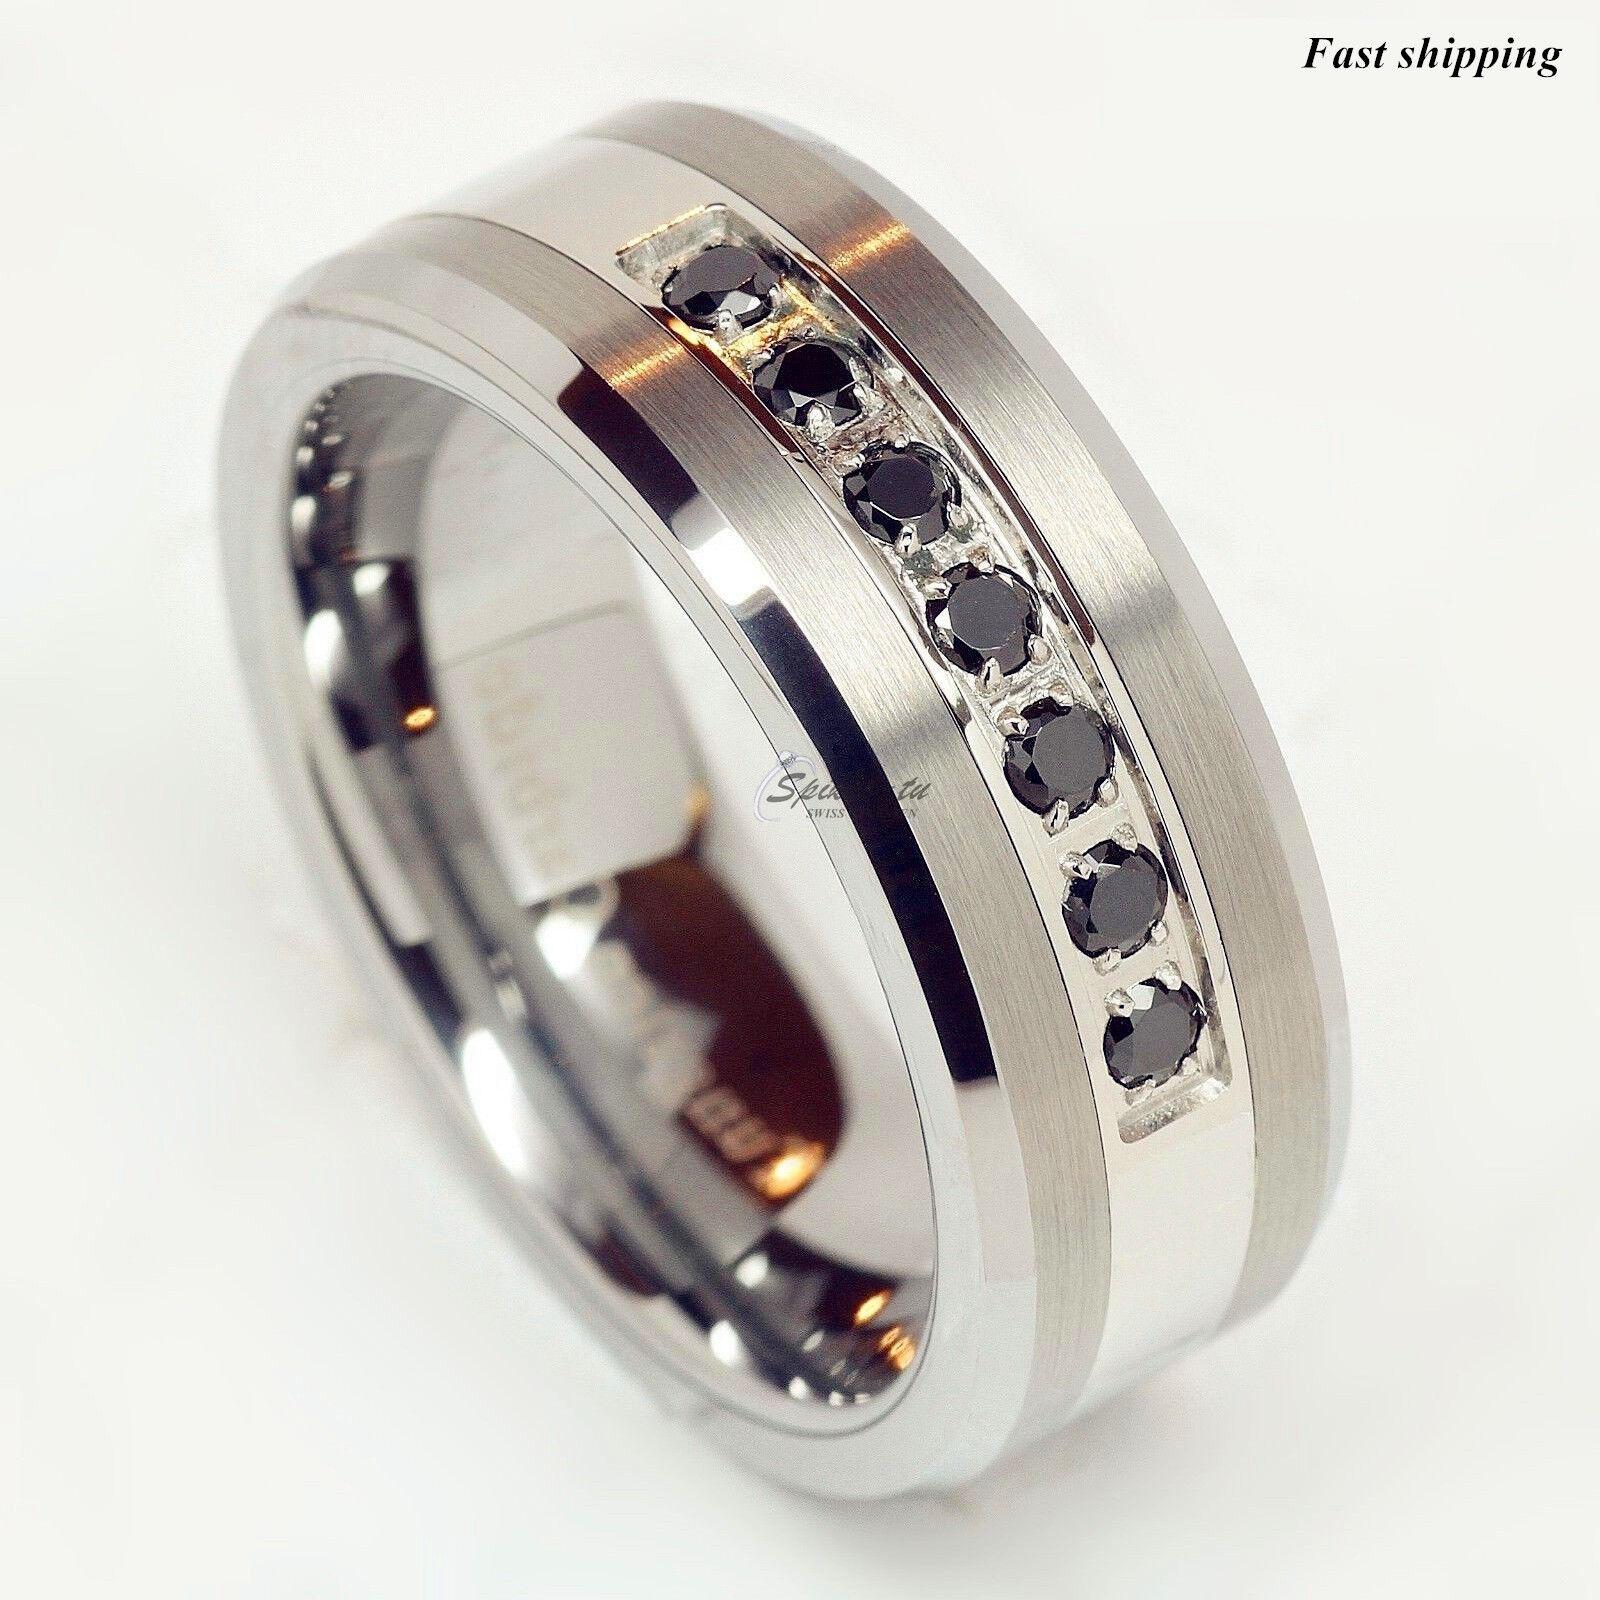 Luxury Atop Tungsten Ring Black Diamonds Mens Wedding Band